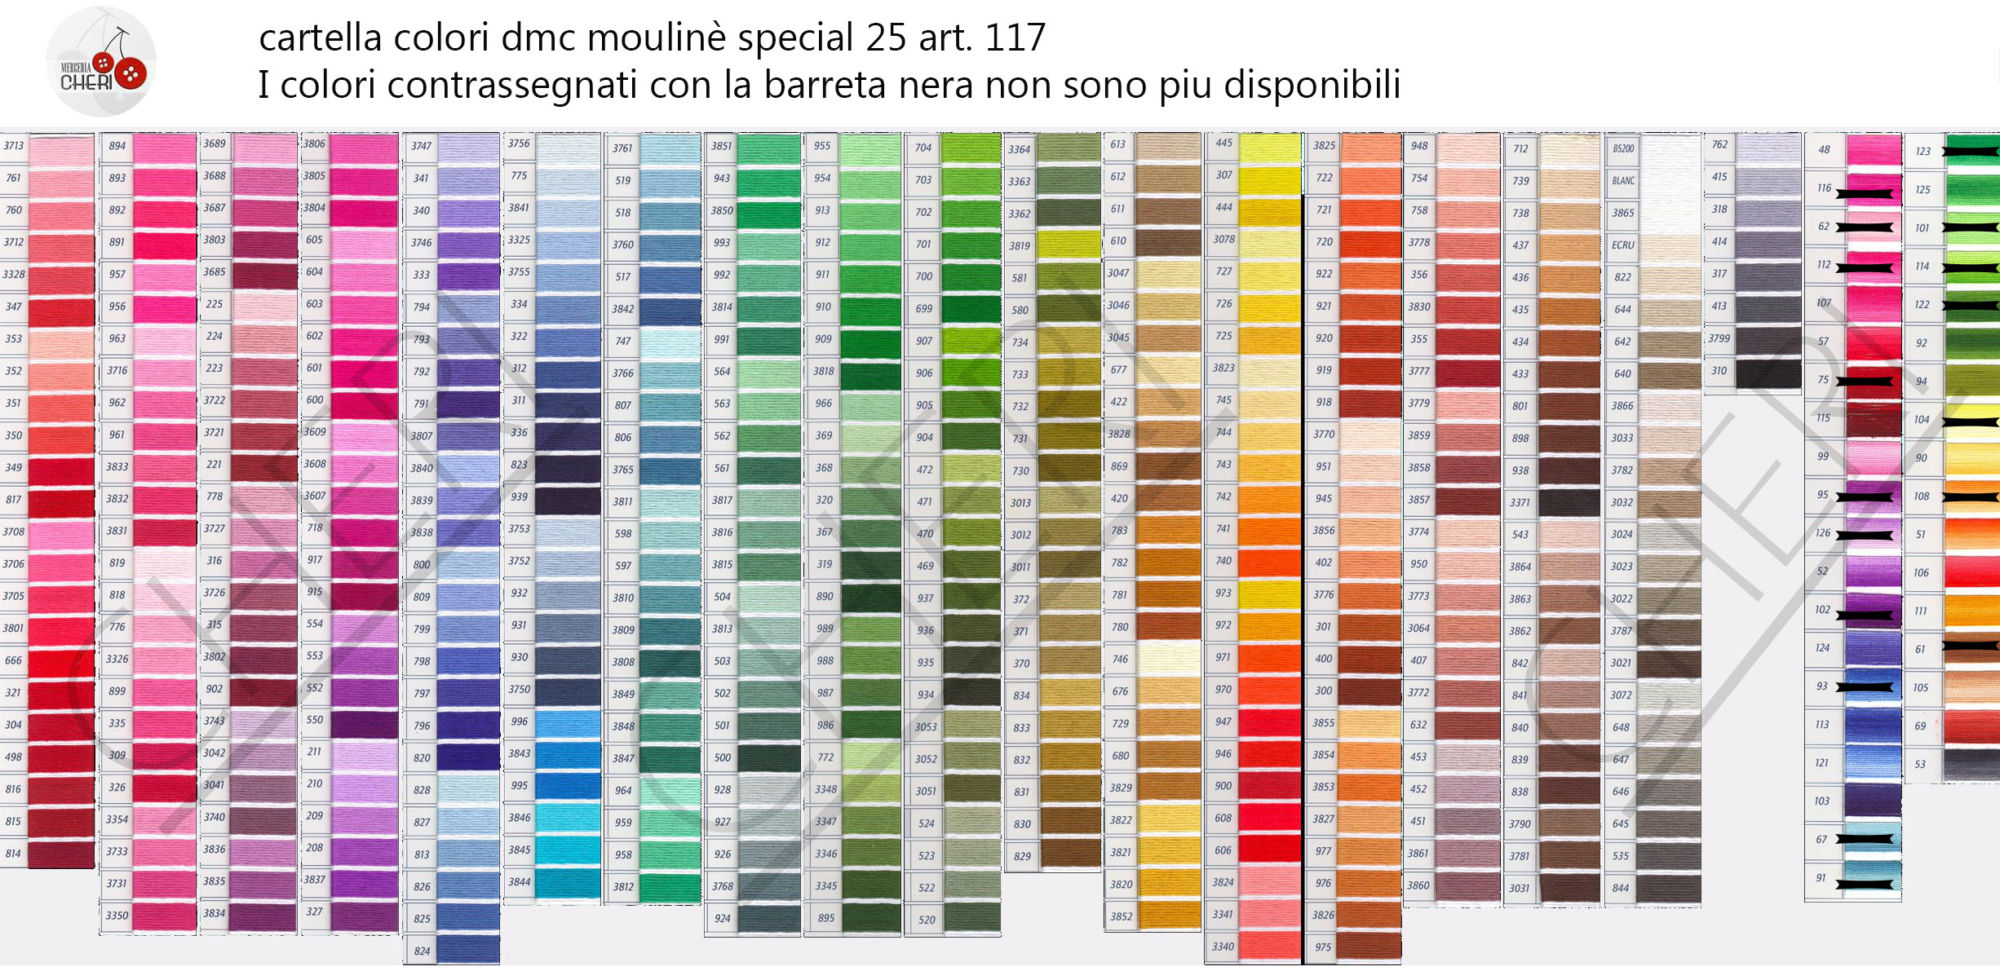 colori-dmc-art-117-cheri